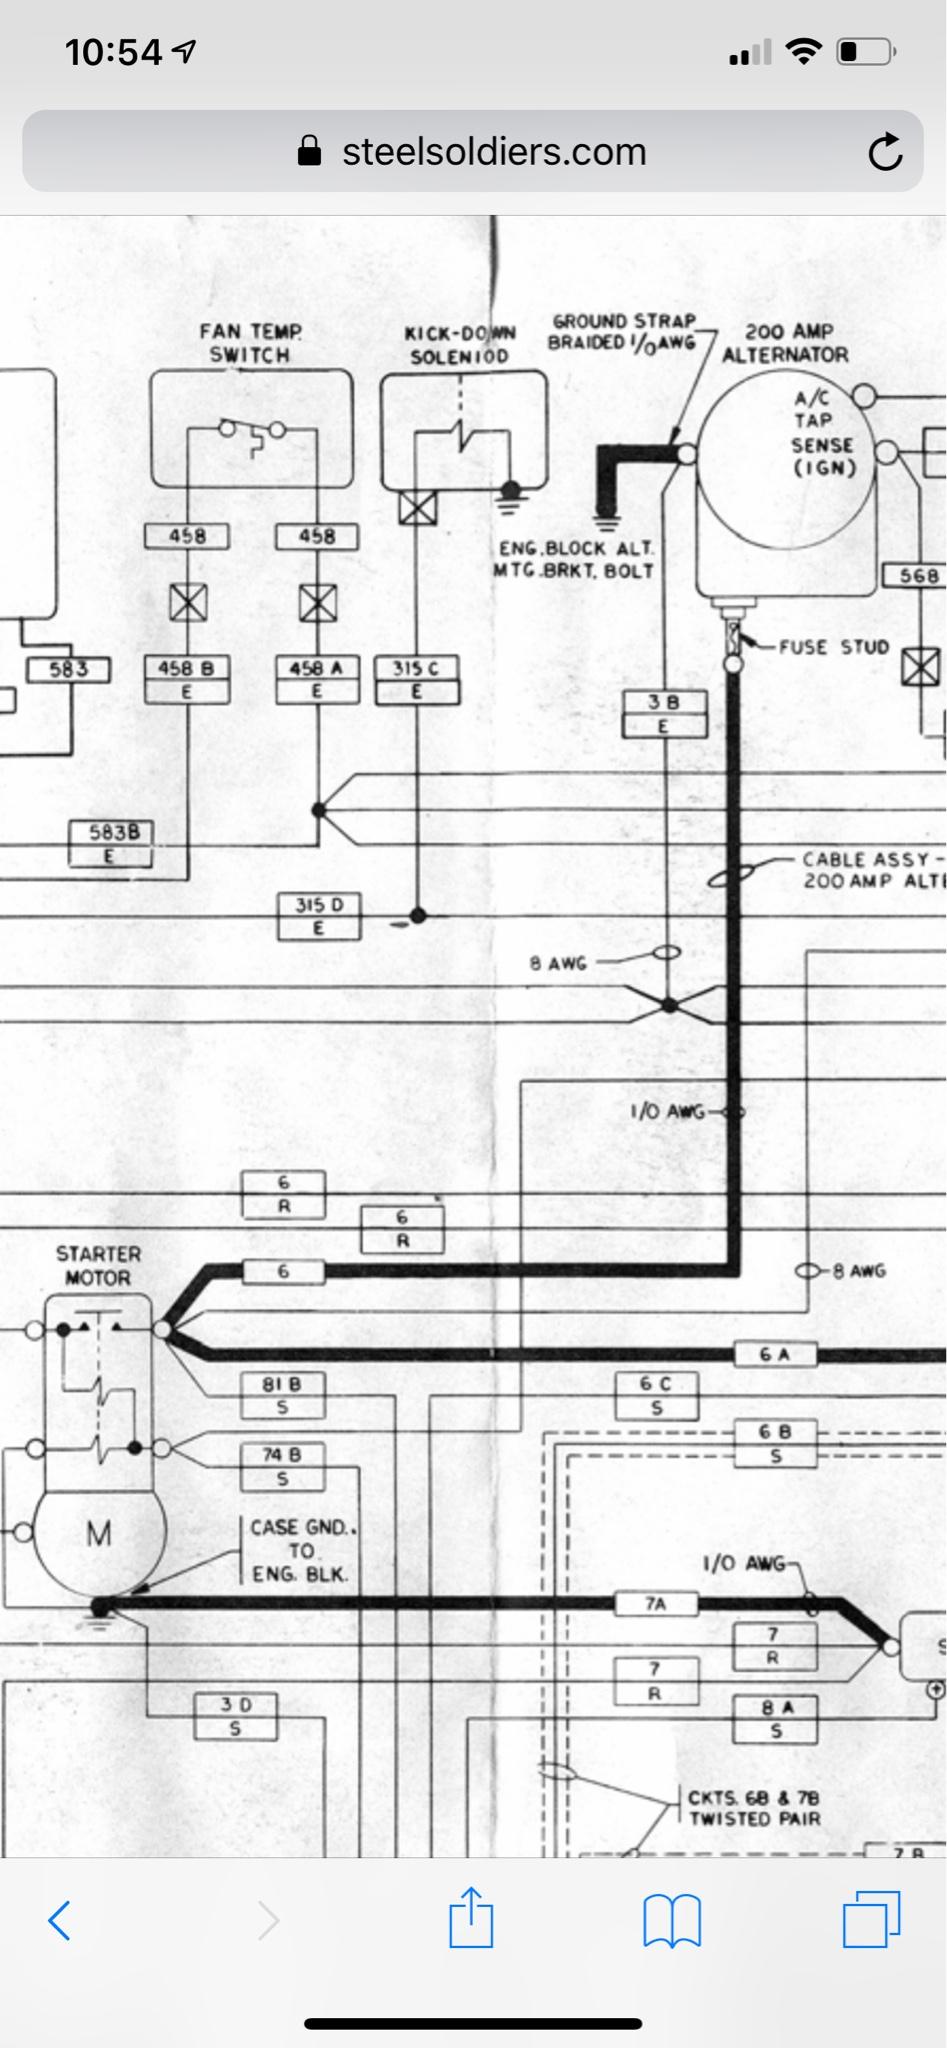 humvee ignition wiring diagram - 2001 dodge 1500 fuse box -  peugeotjetforce.bmw-in-e46.jeanjaures37.fr  wiring diagram resource